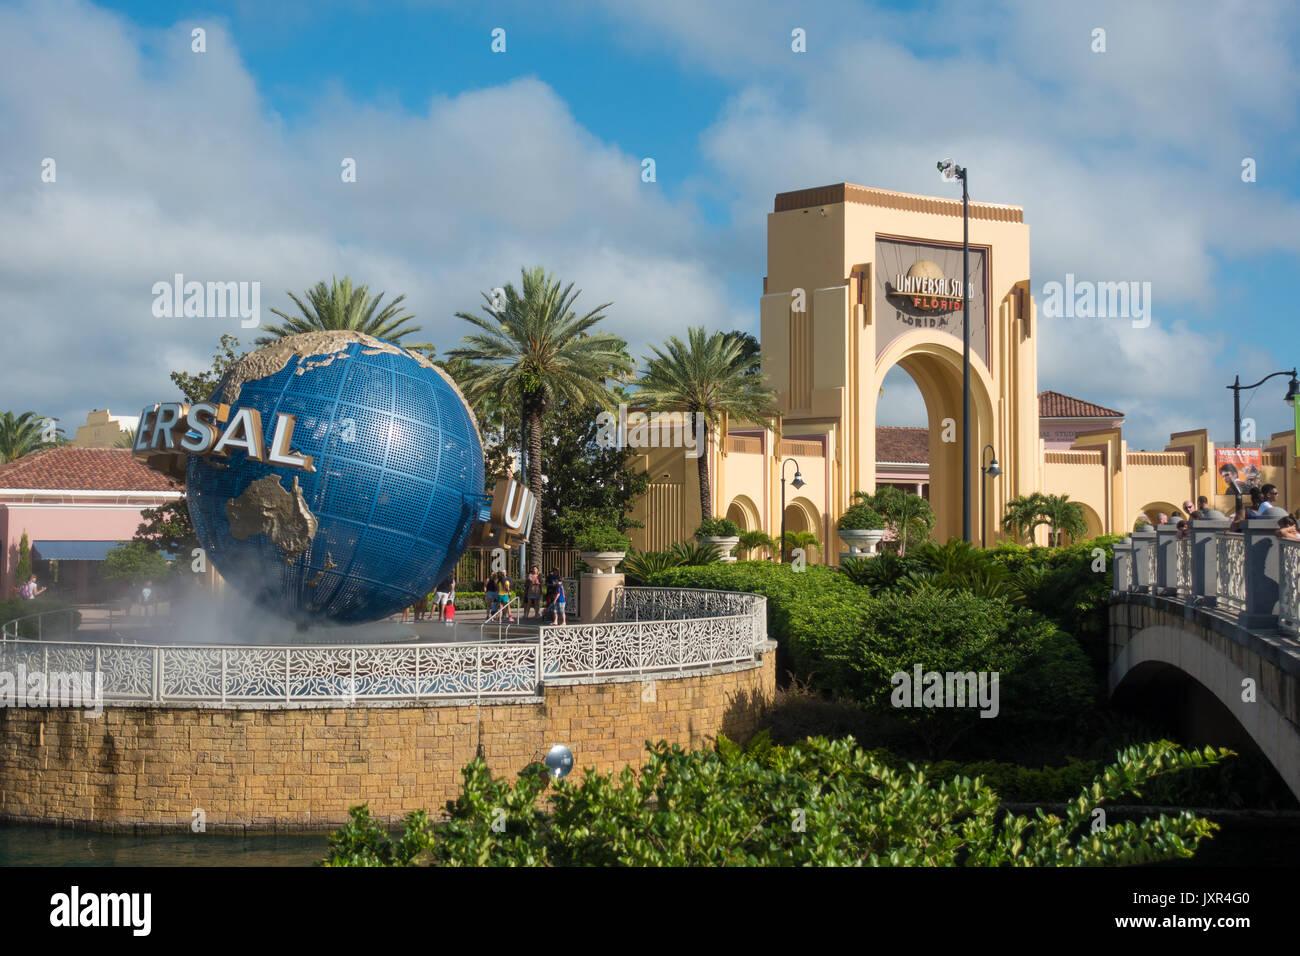 The Universal Globe at the Entrance to Universal Studios Orlando, Florida. - Stock Image